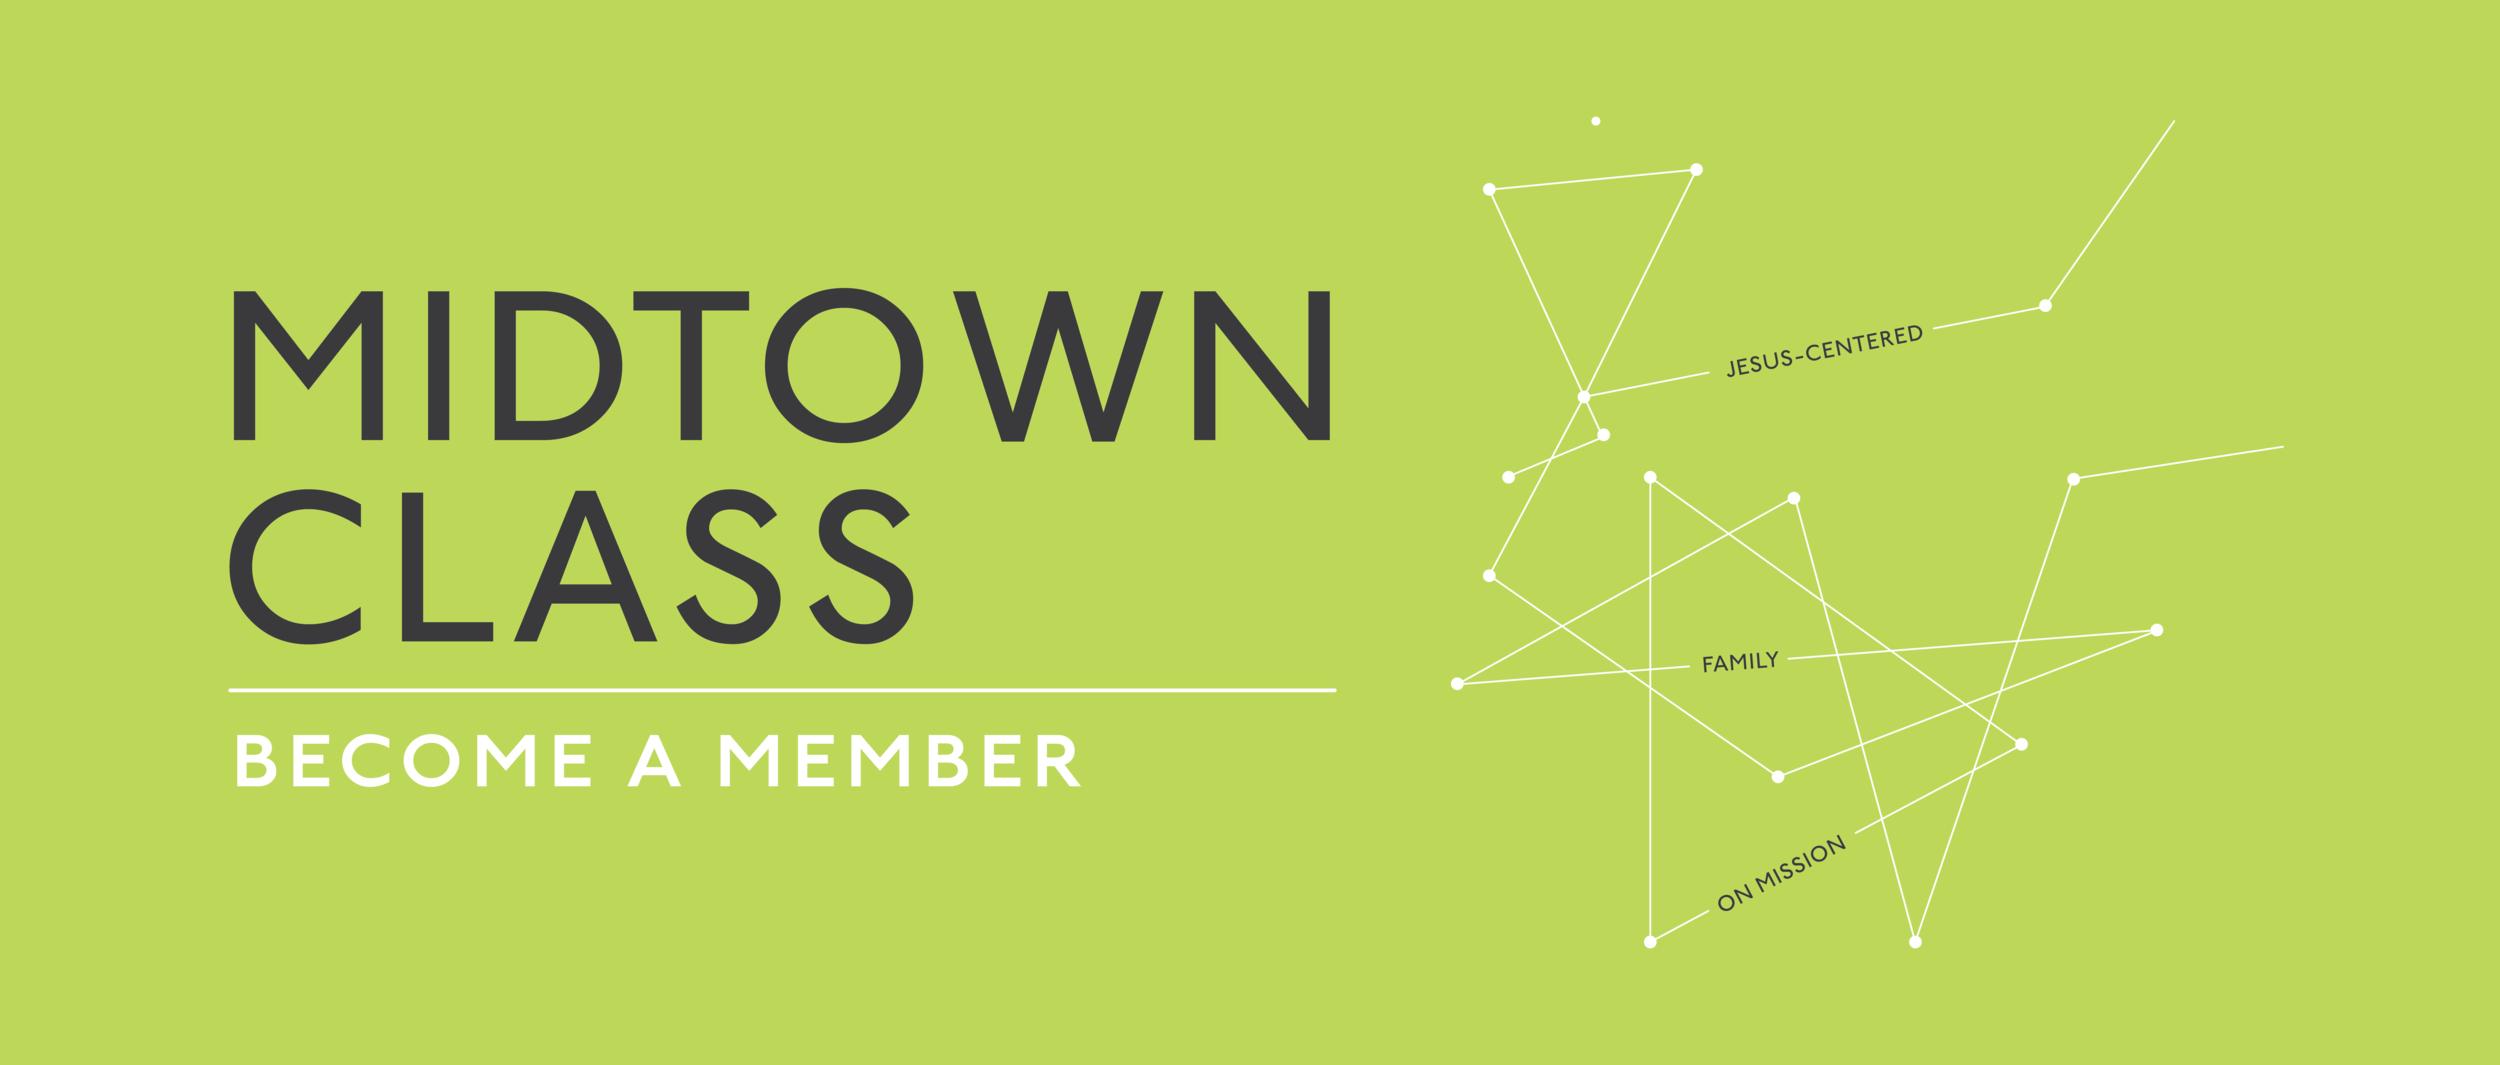 New_Midtown_Class_Web-01.png